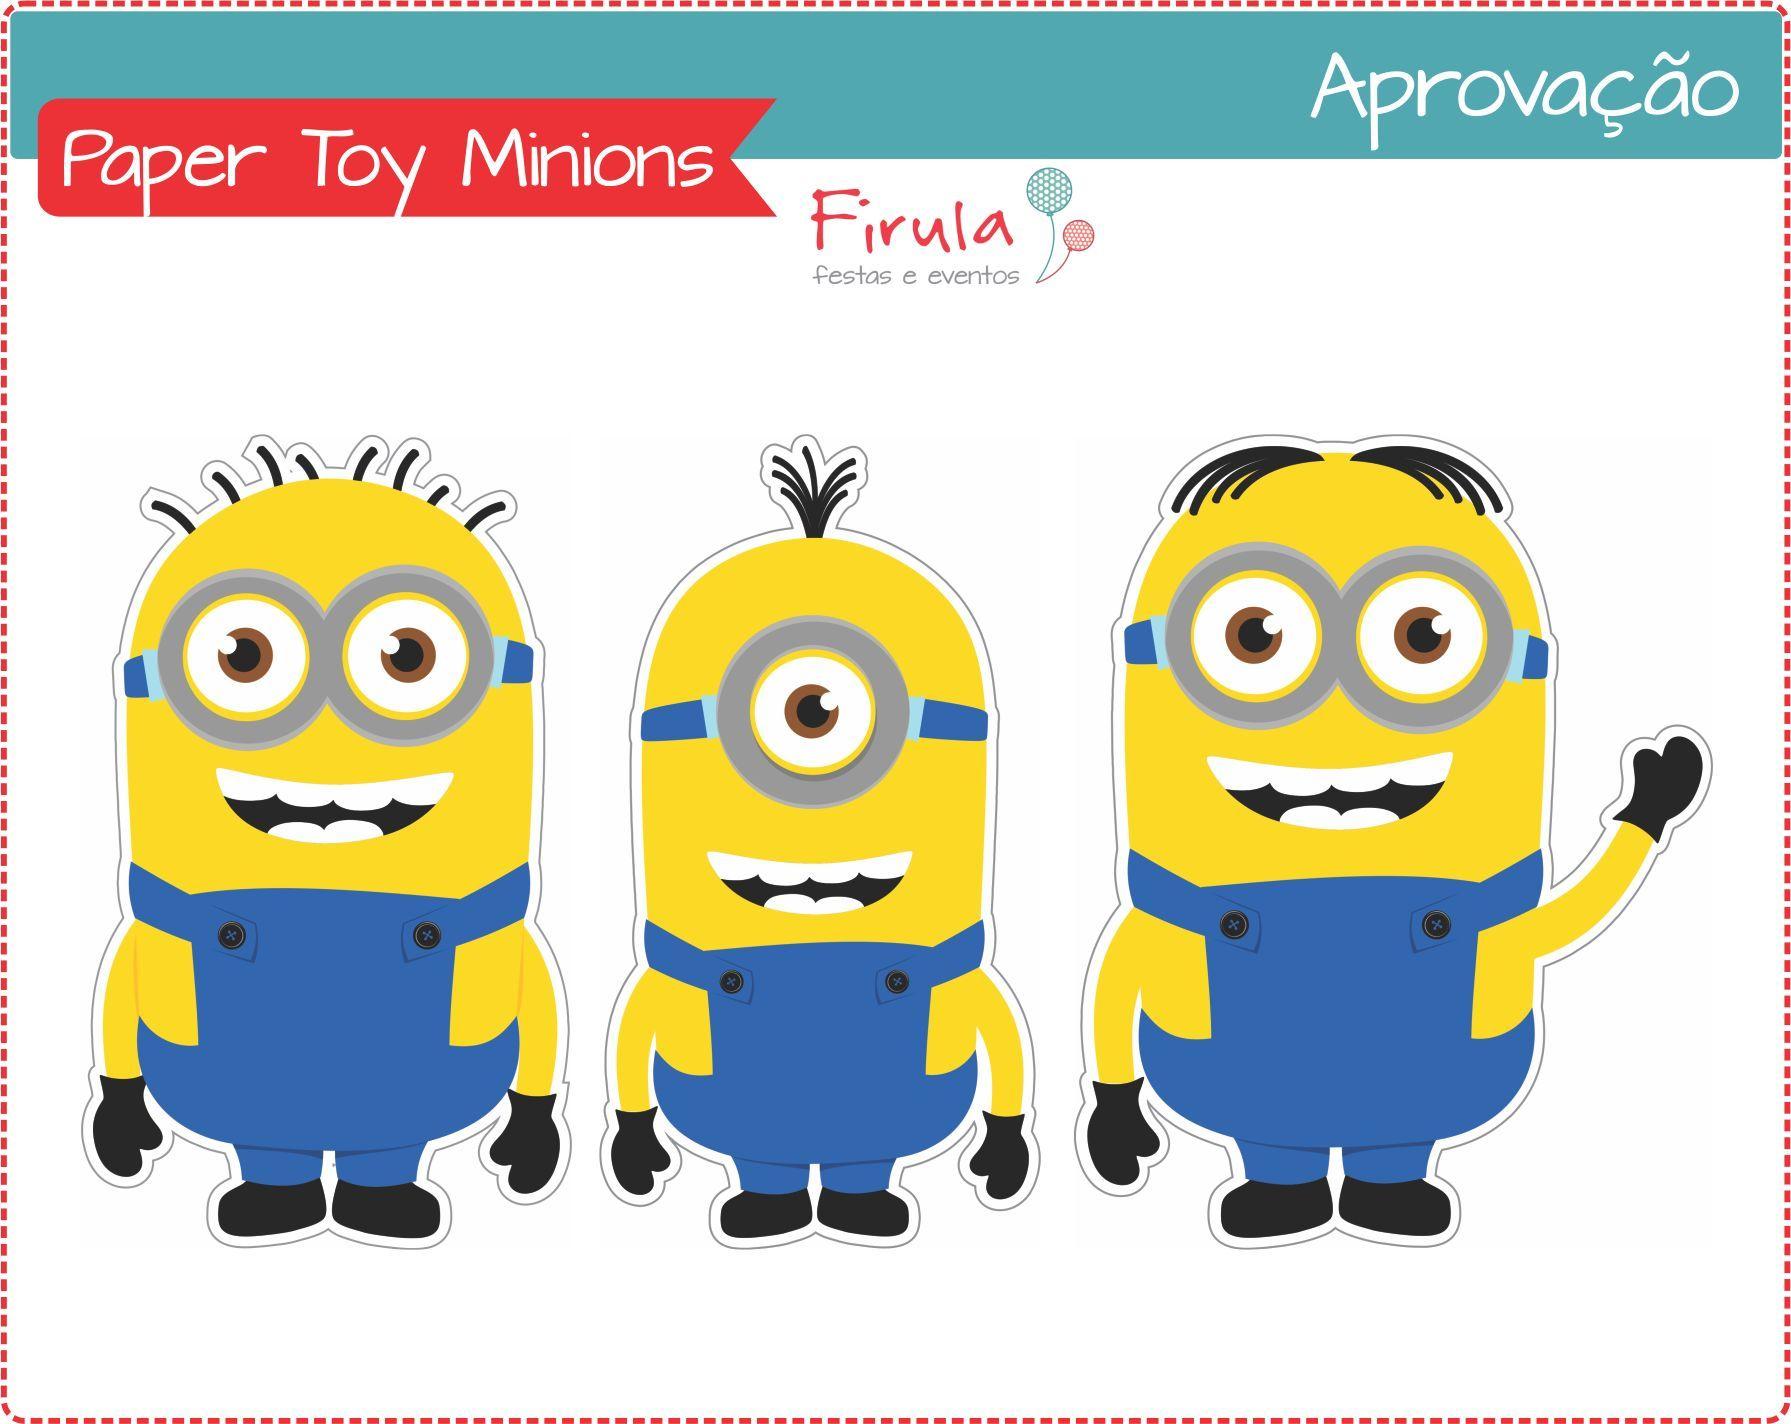 http://img.elo7.com.br/product/original/988AD8/paper-toy-minions-meu ...